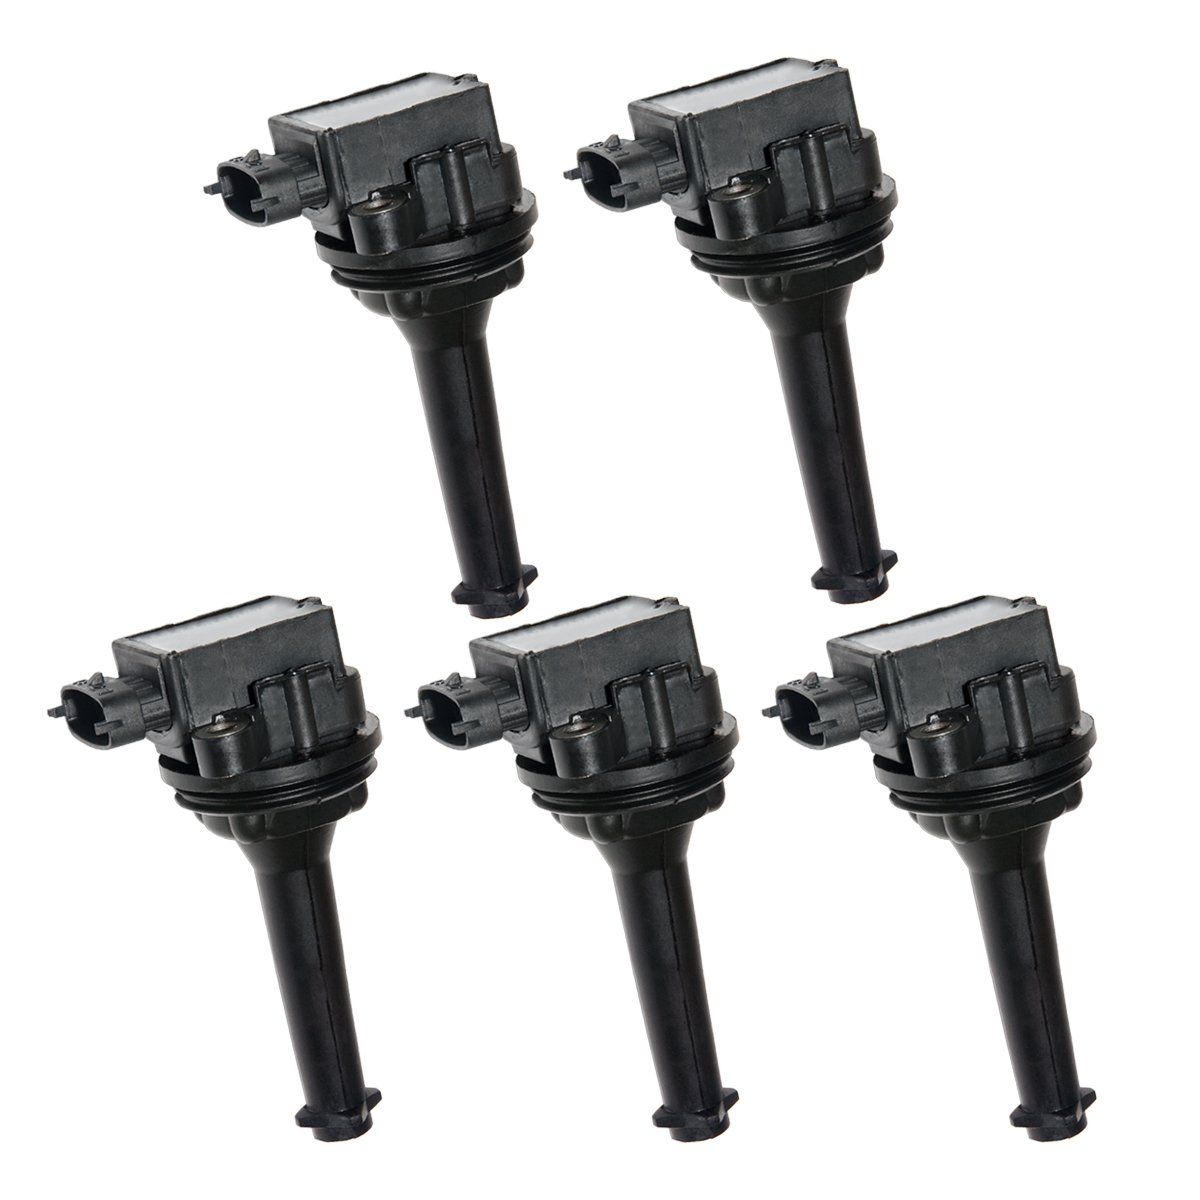 Premium Ignition coil 5 Pack for Volvo C70 S70 XC70 XC90 S60 L5 L6 2.3L 2.4L 2.5L 2.9L UF341 C1258 9125601